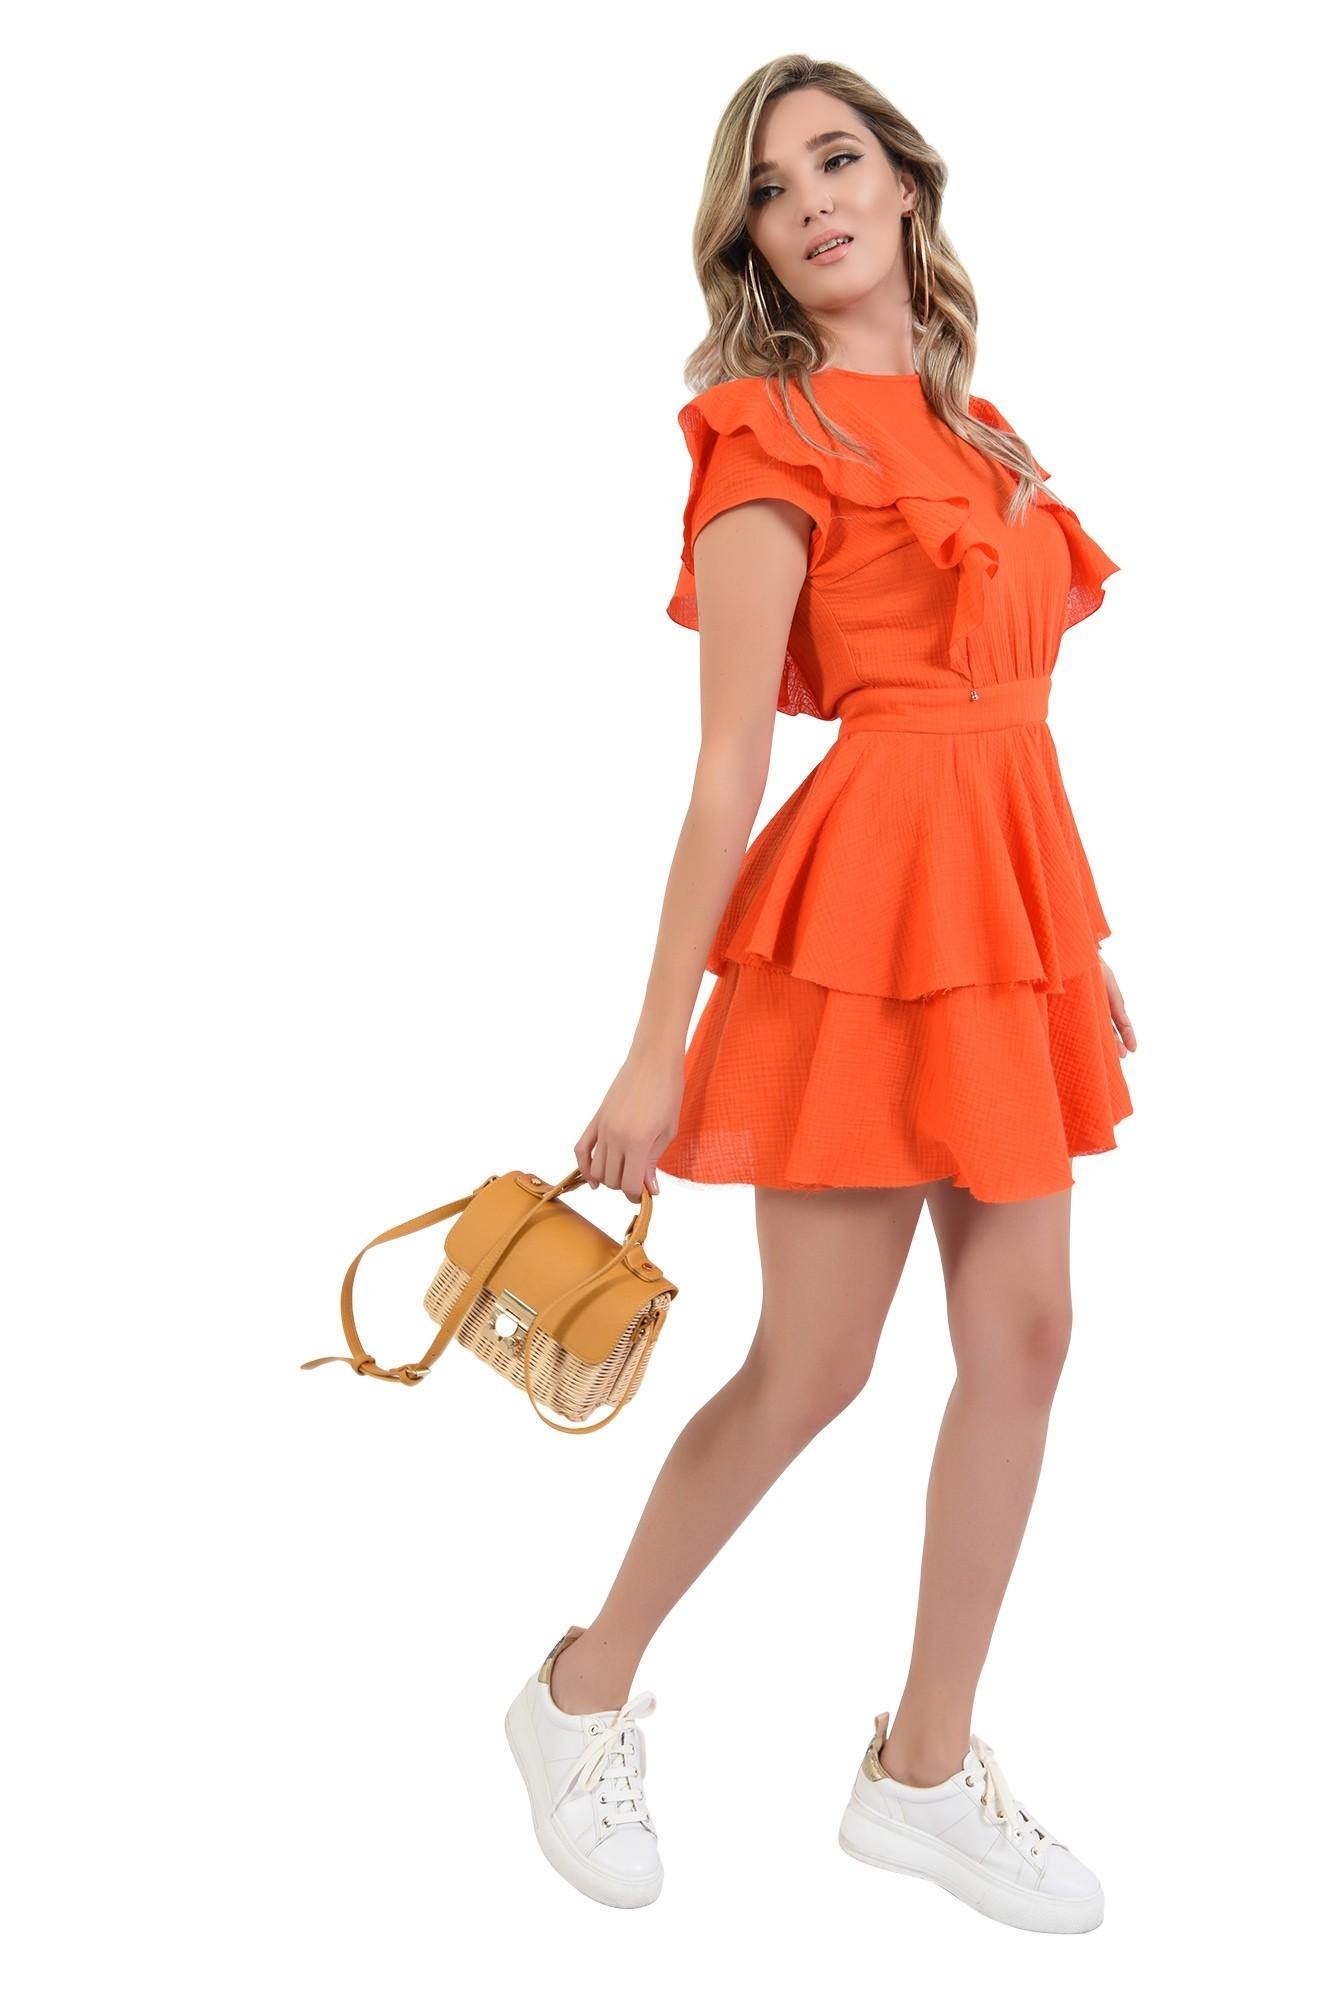 360 - rochie mini, orange, cu volane, Poema